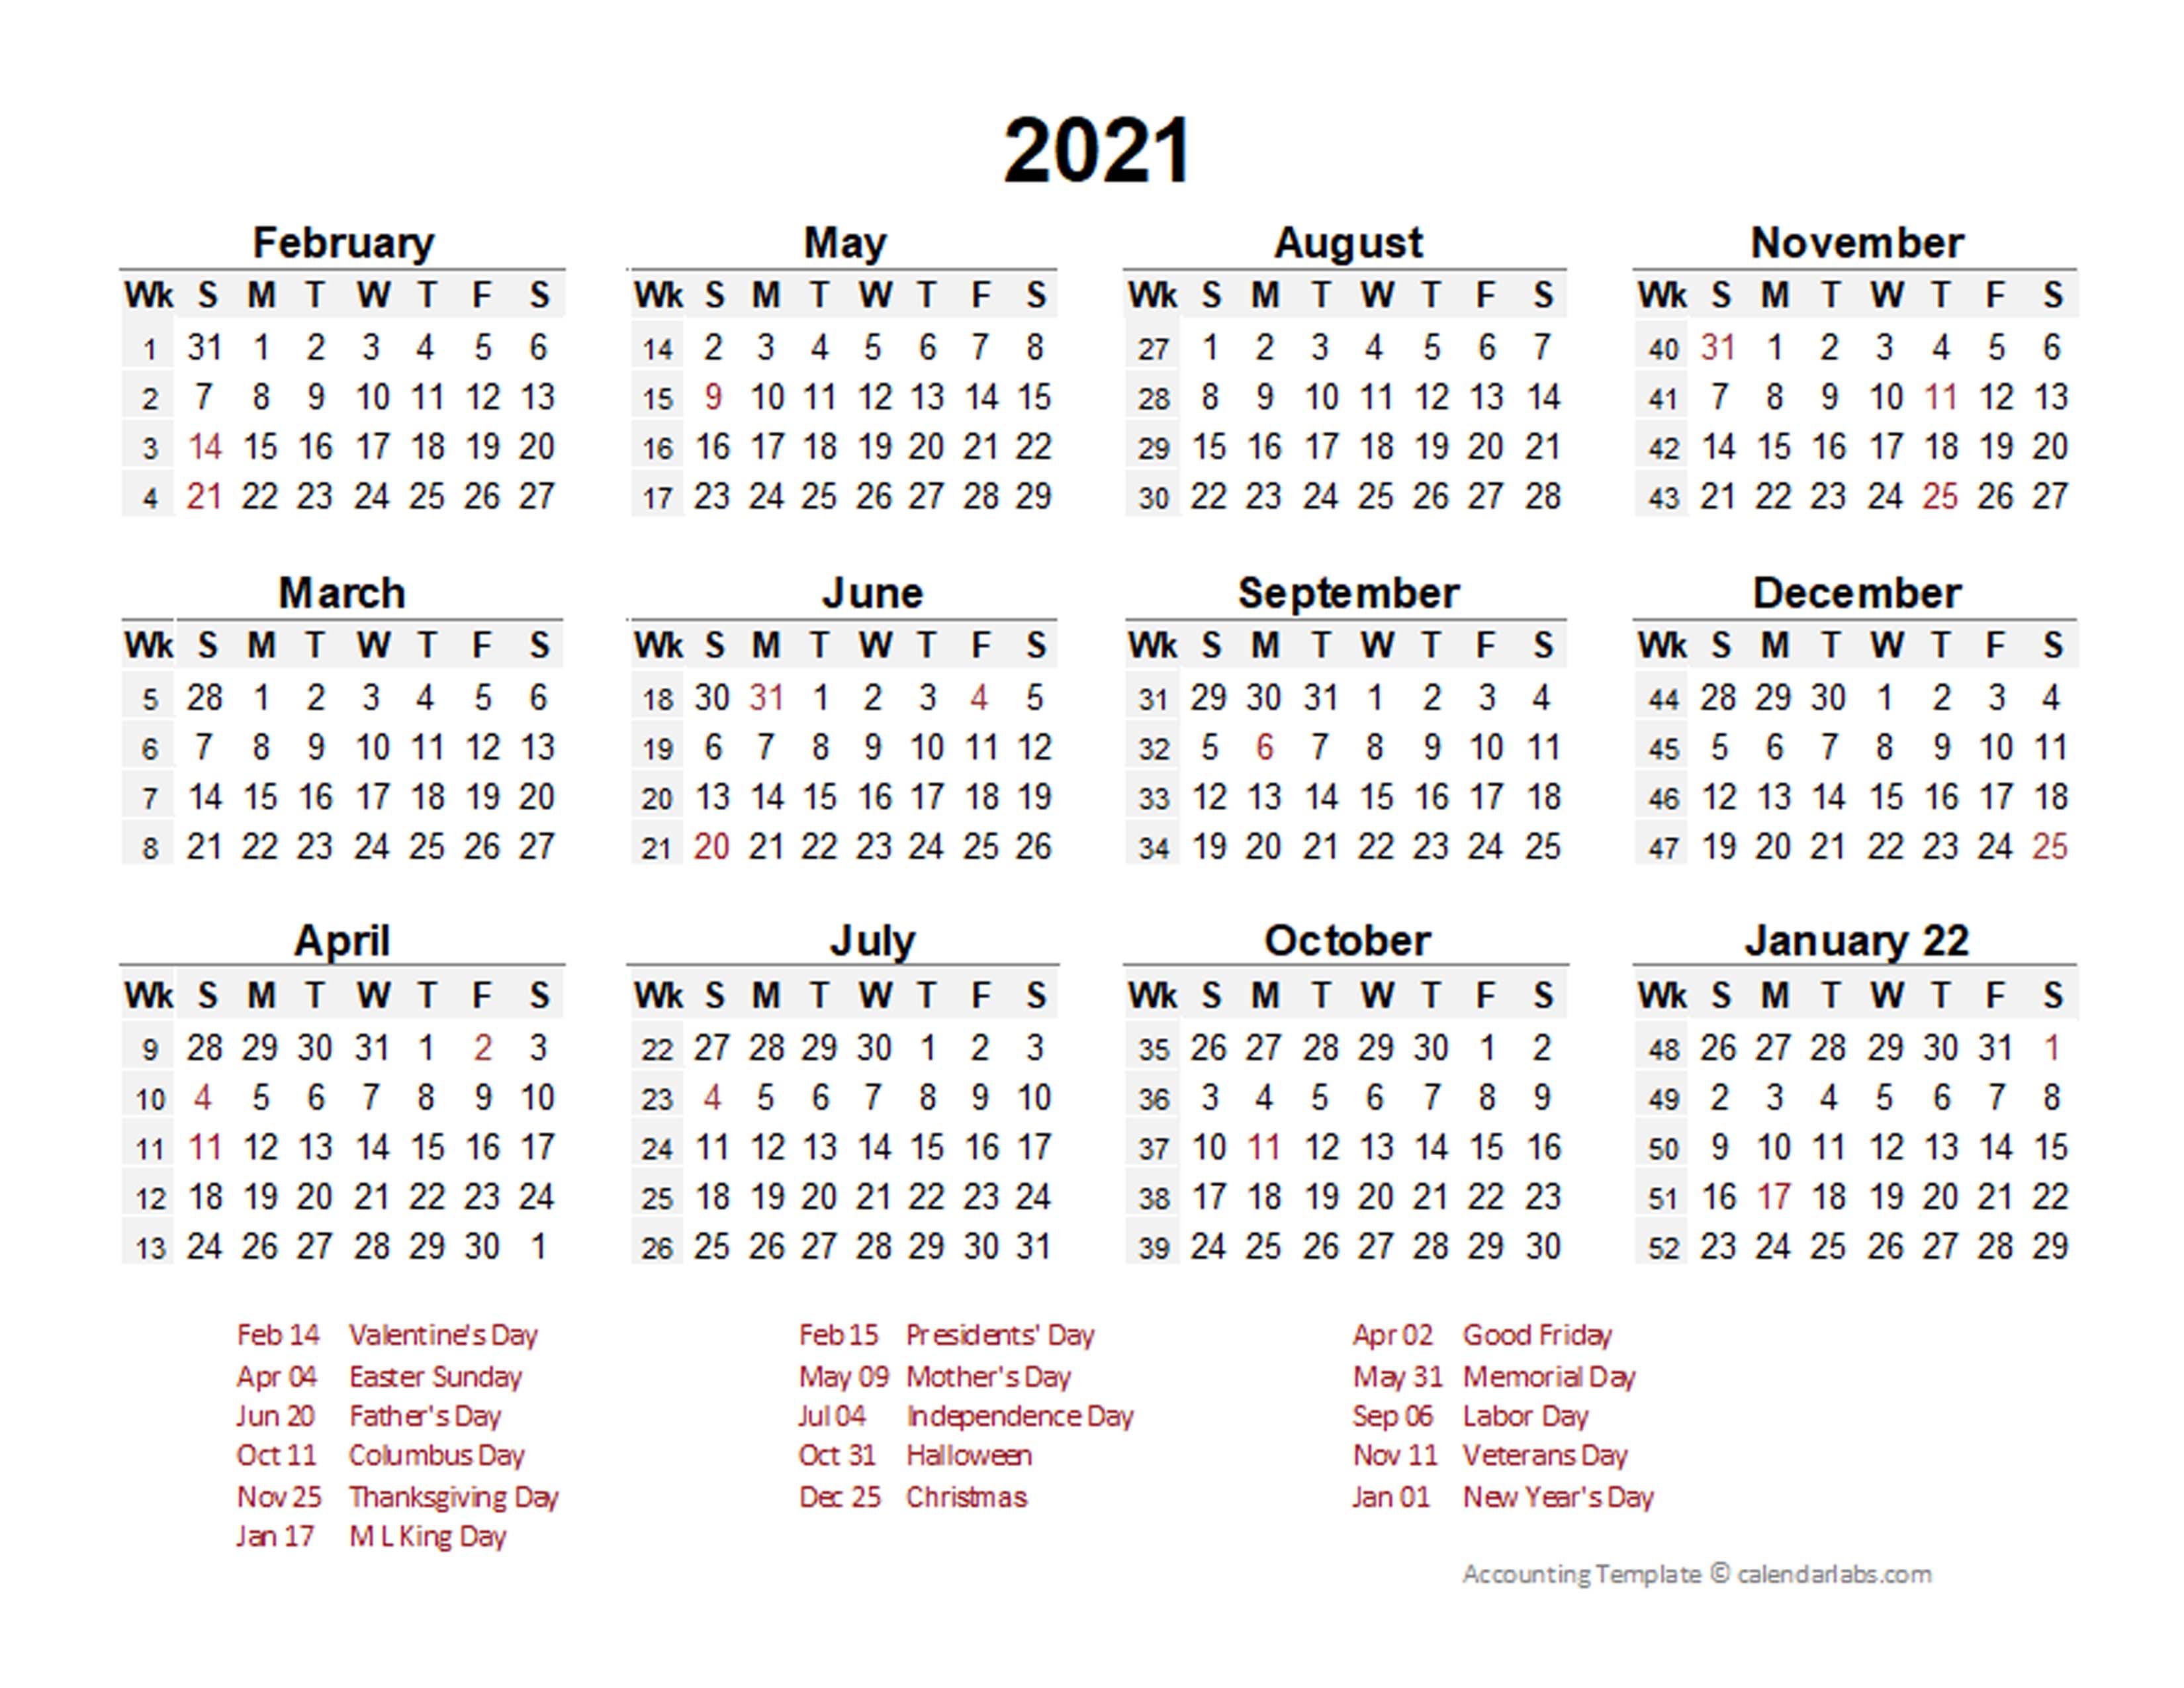 2021 Accounting Period Calendar 4-4-5 - Free Printable ...